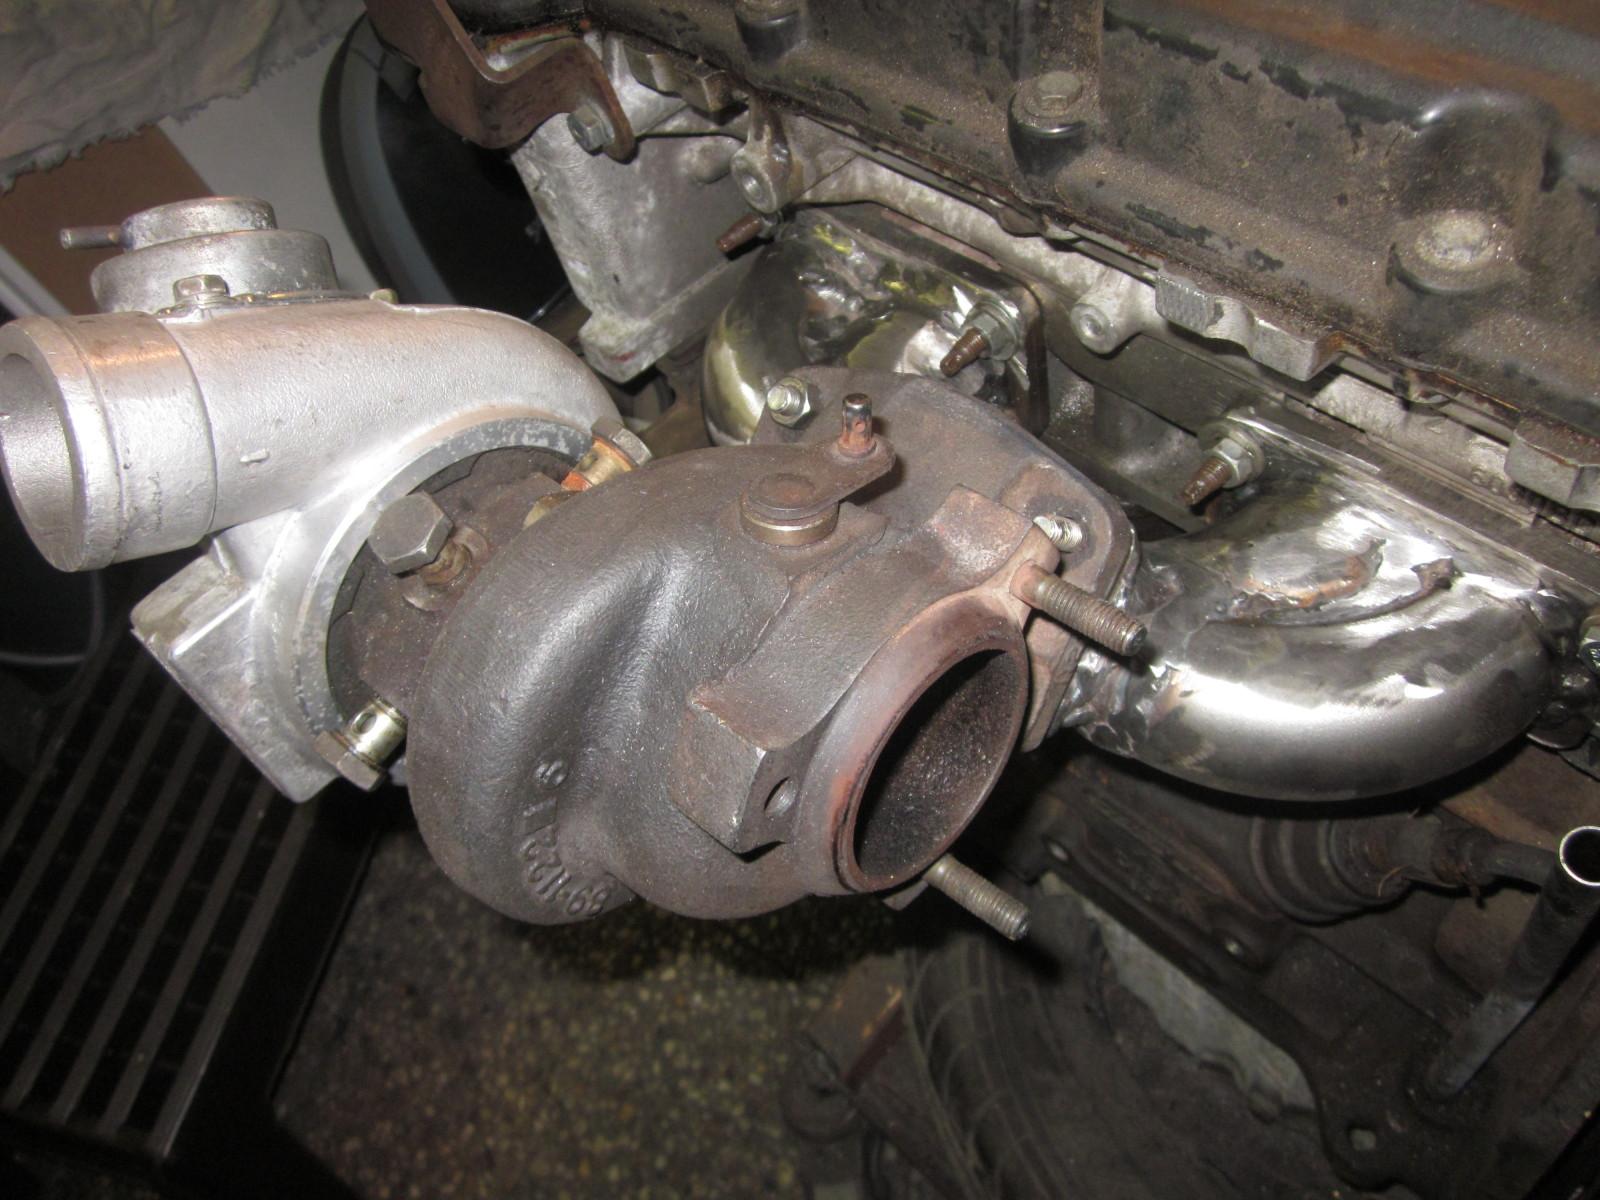 Ford Sierra 2.0 DOHC Turbo. 4u80pc